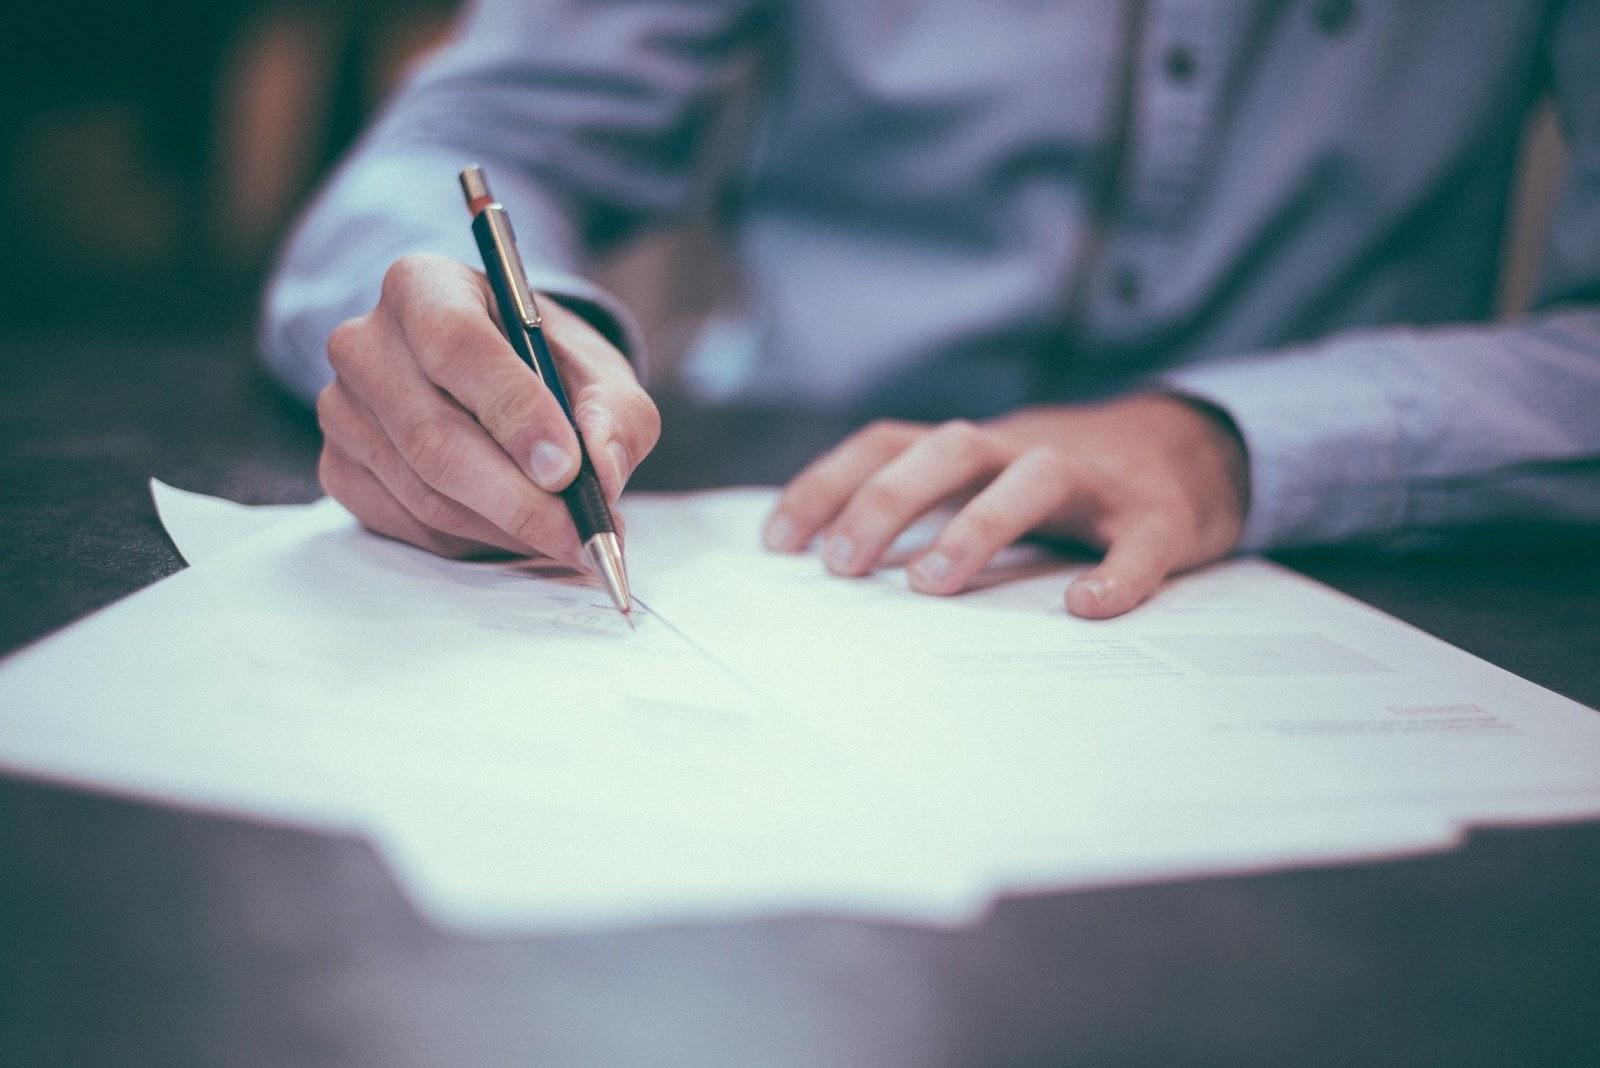 Cara dan Syarat Buat Surat Keterangan Tidak Mampu (SKTM) untuk Beasiswa dan KIP 2020